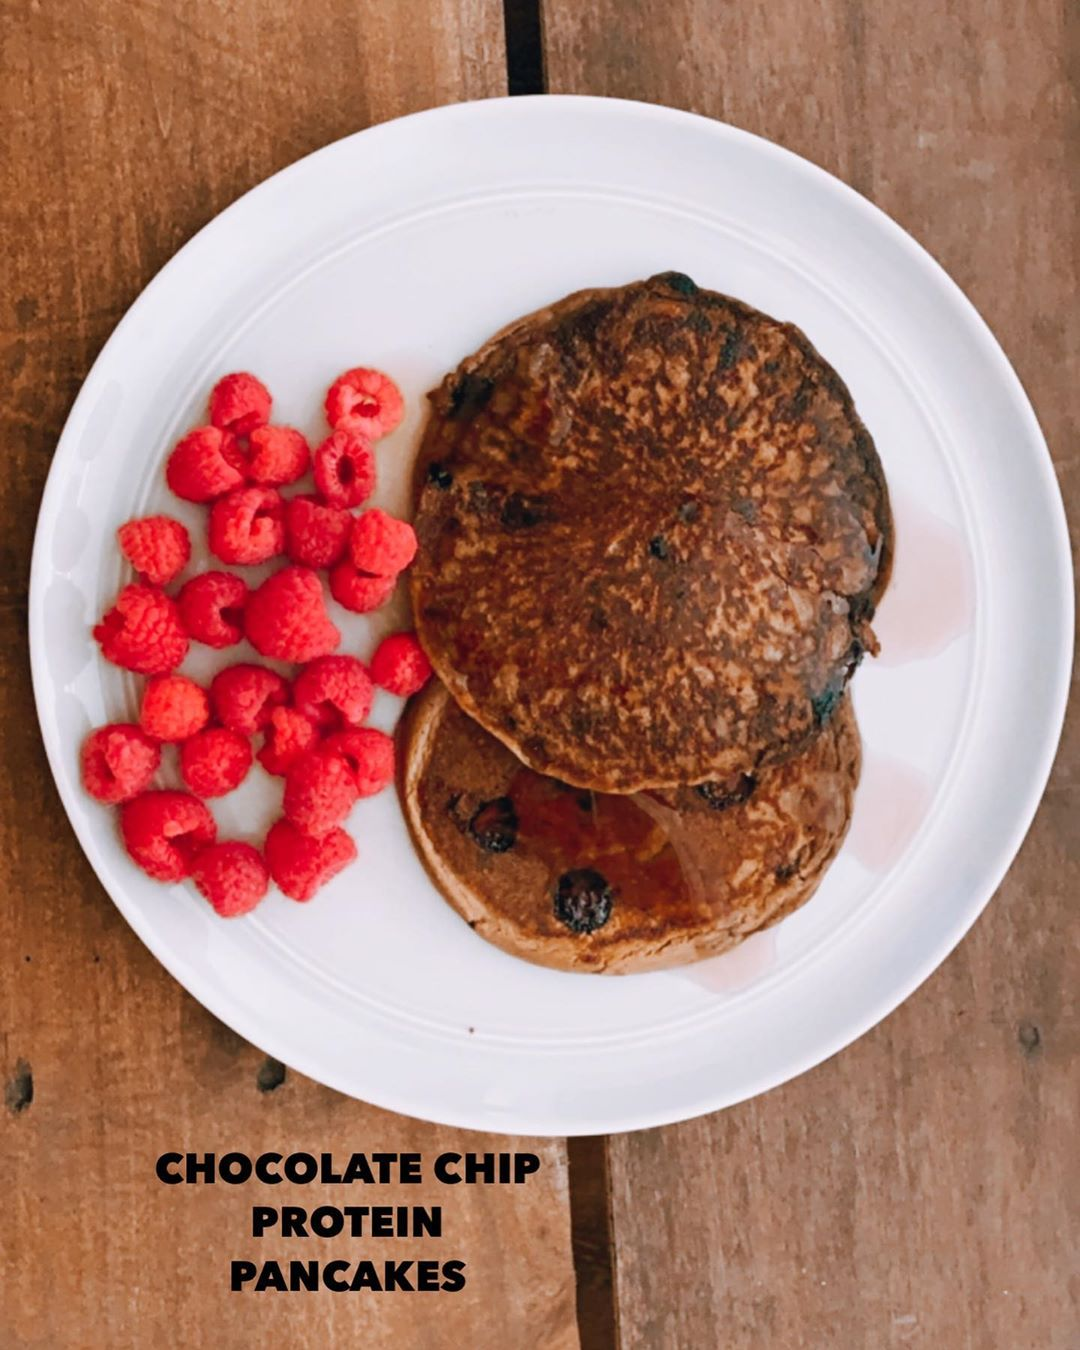 Making Chocolate Chip Protein Pancakes